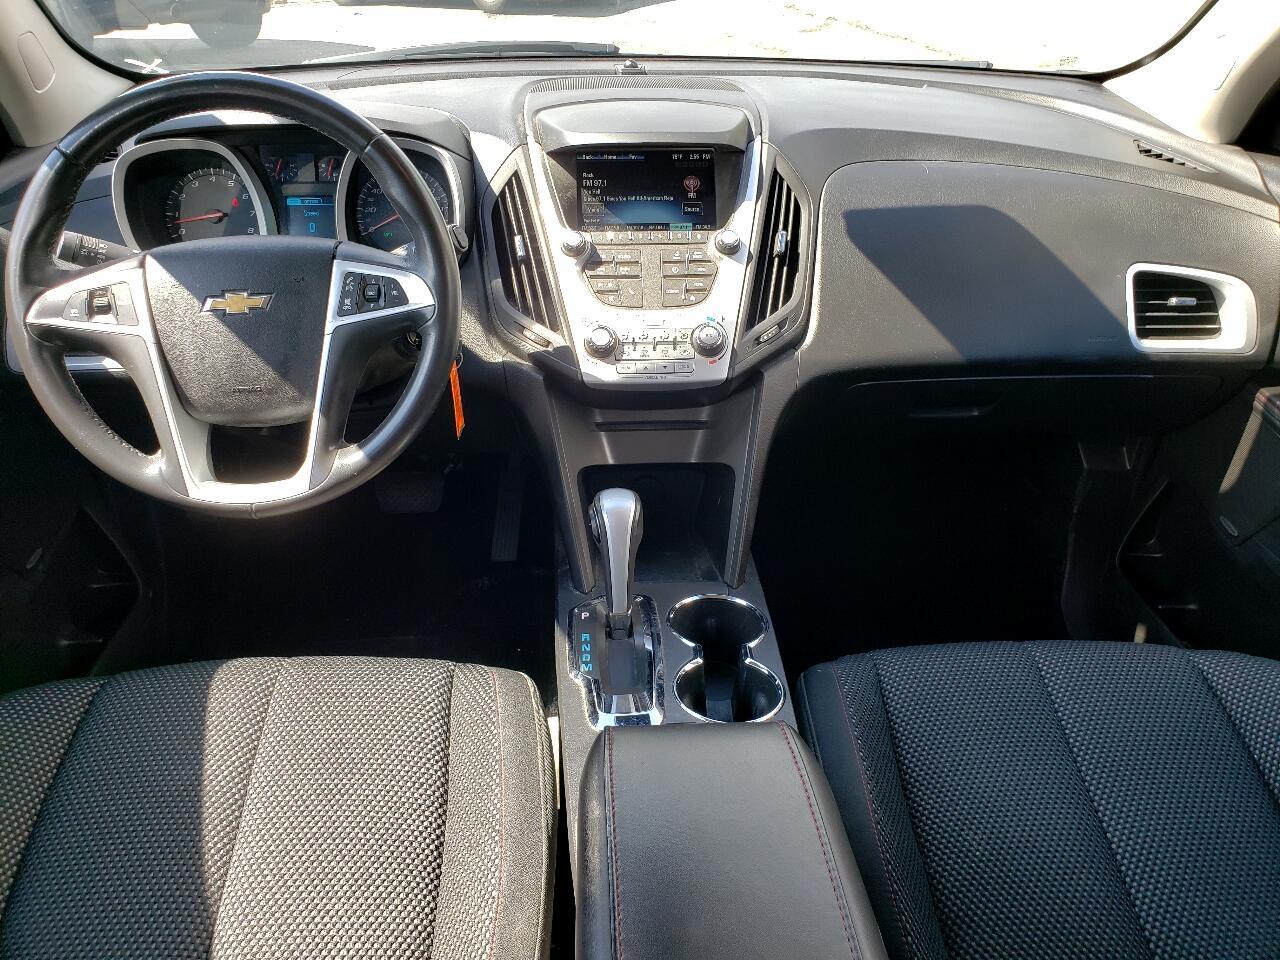 2013 Chevrolet Equinox FWD 4dr LT w/1LT